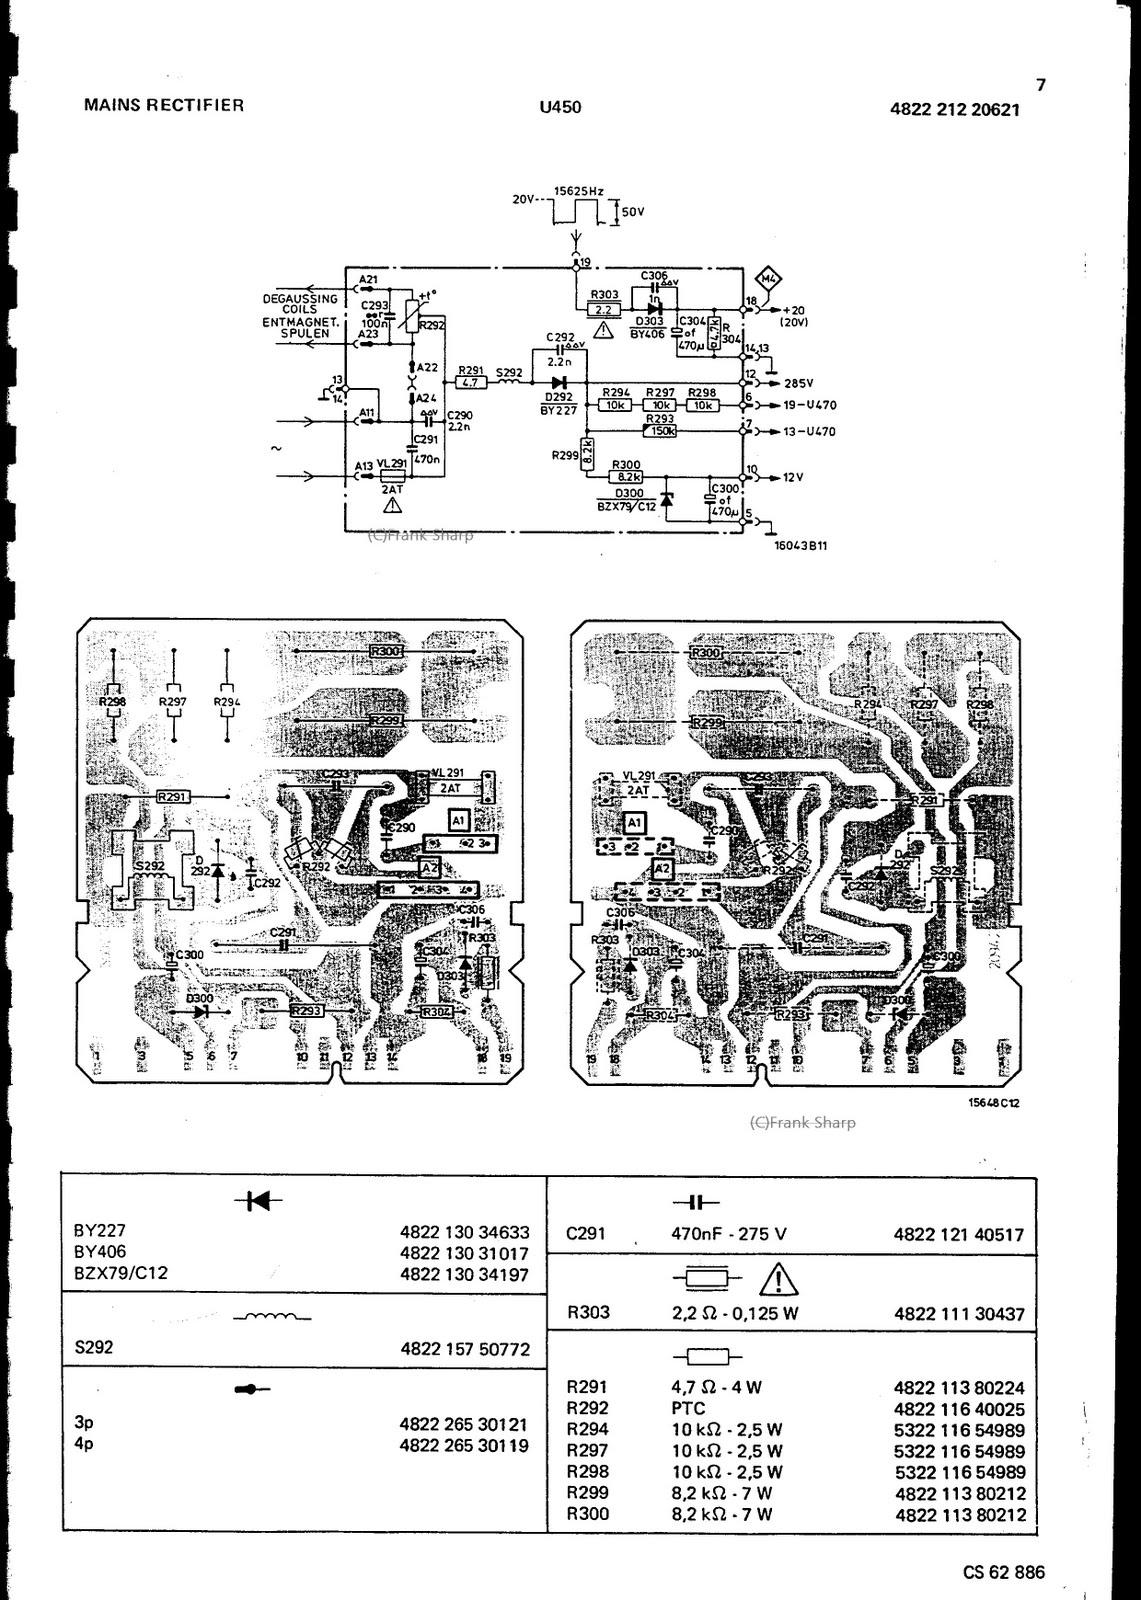 Modern Refrigeration Diagram Symbols Image Collection - Wiring ...